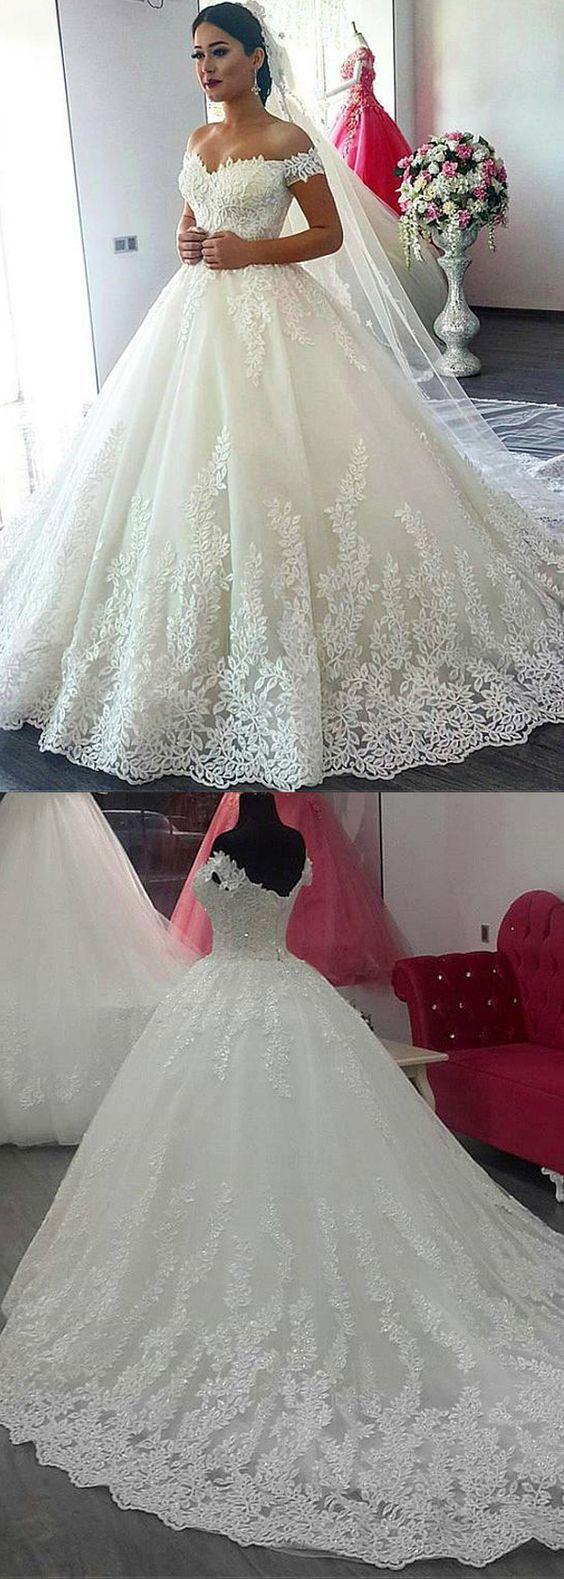 Off White Wedding Dresses,Modest Bridal Gown,Ball Gown Wedding Dresses,Off the Shoulder Wedding Dress,Romantic Wedding Dresses #wedding #ballgown #offshoulder #appliques #offwhite #okdresses